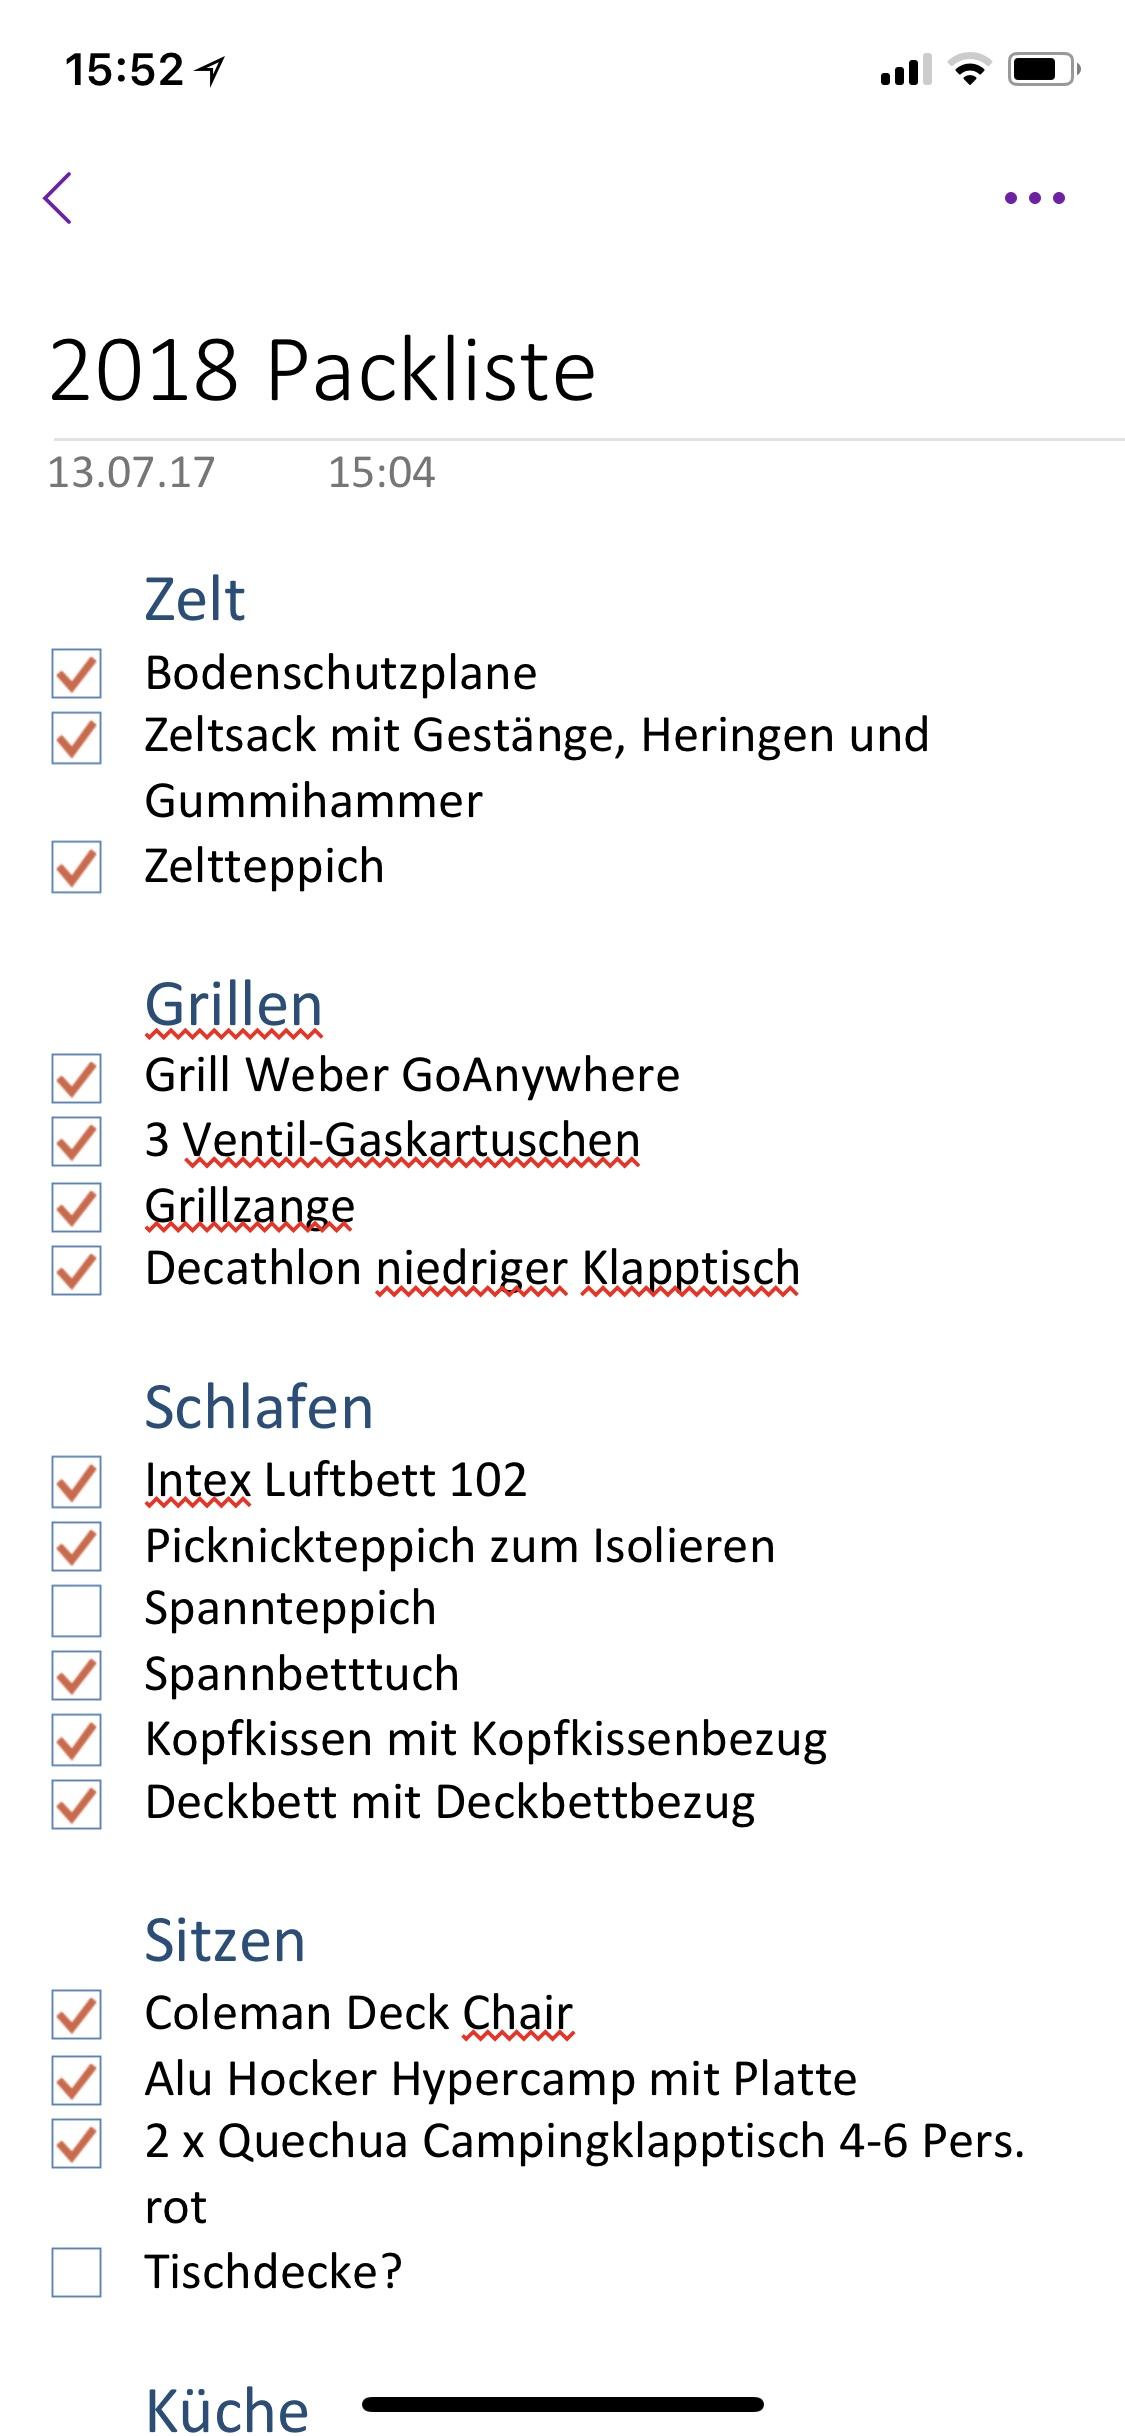 OneNote Packliste